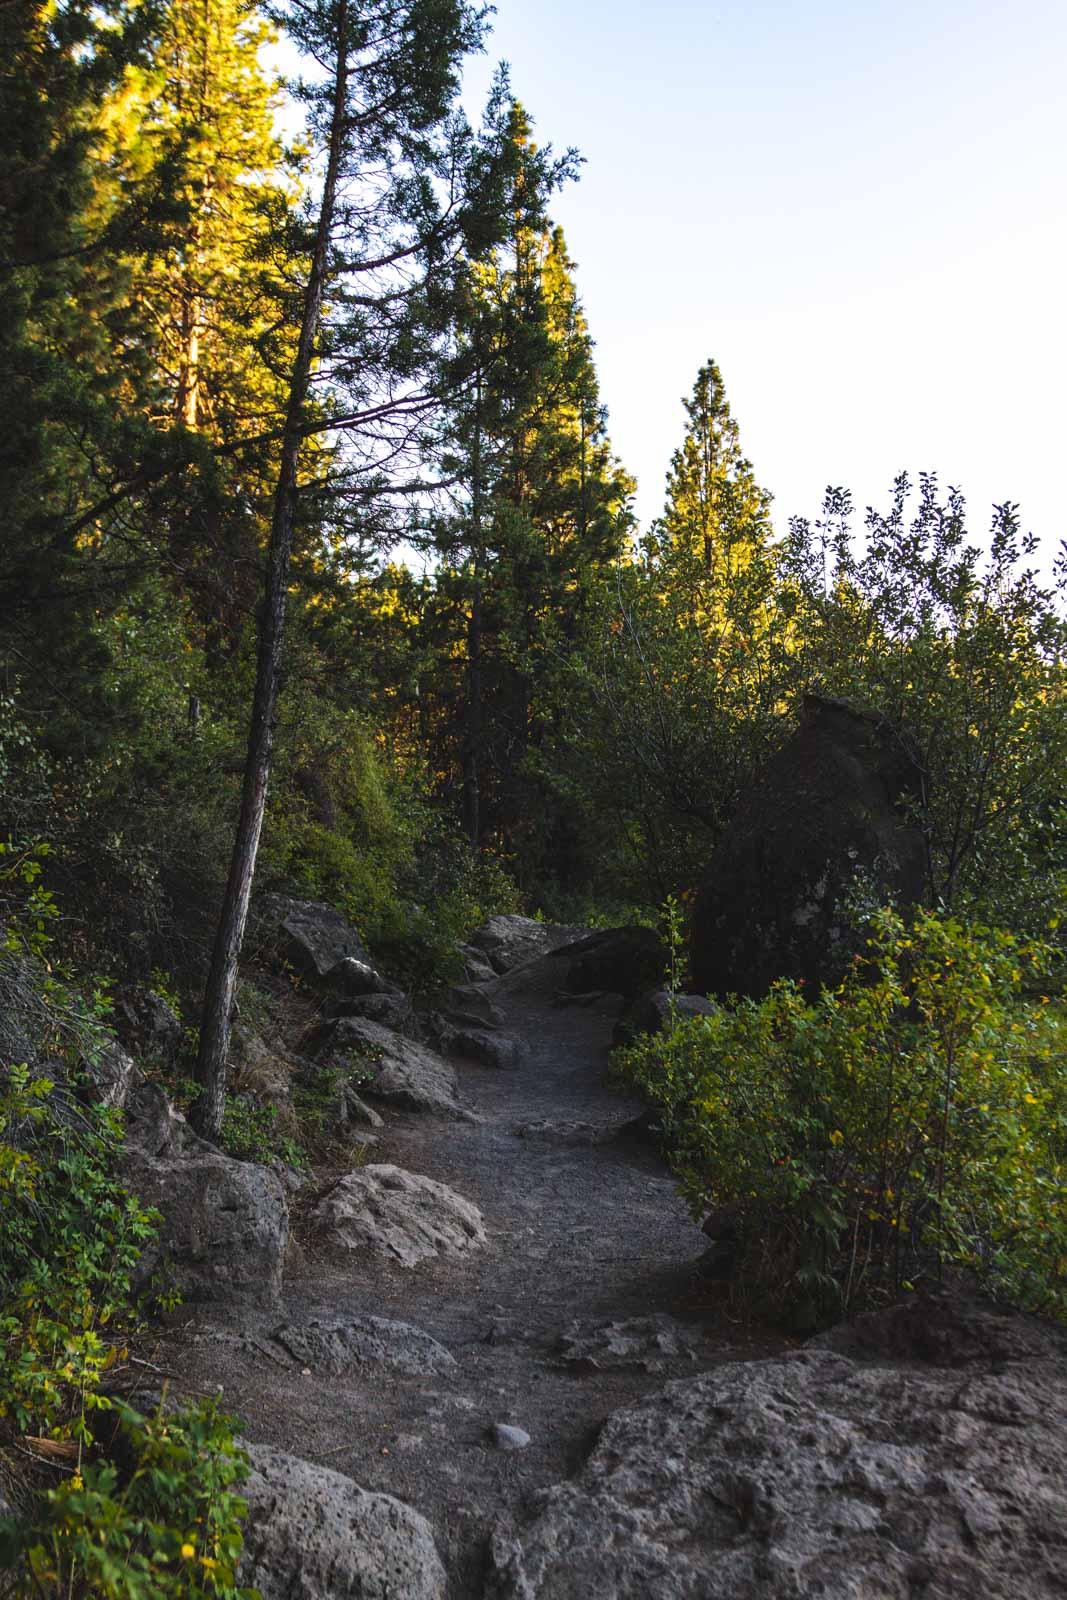 The Deschutes River Trail